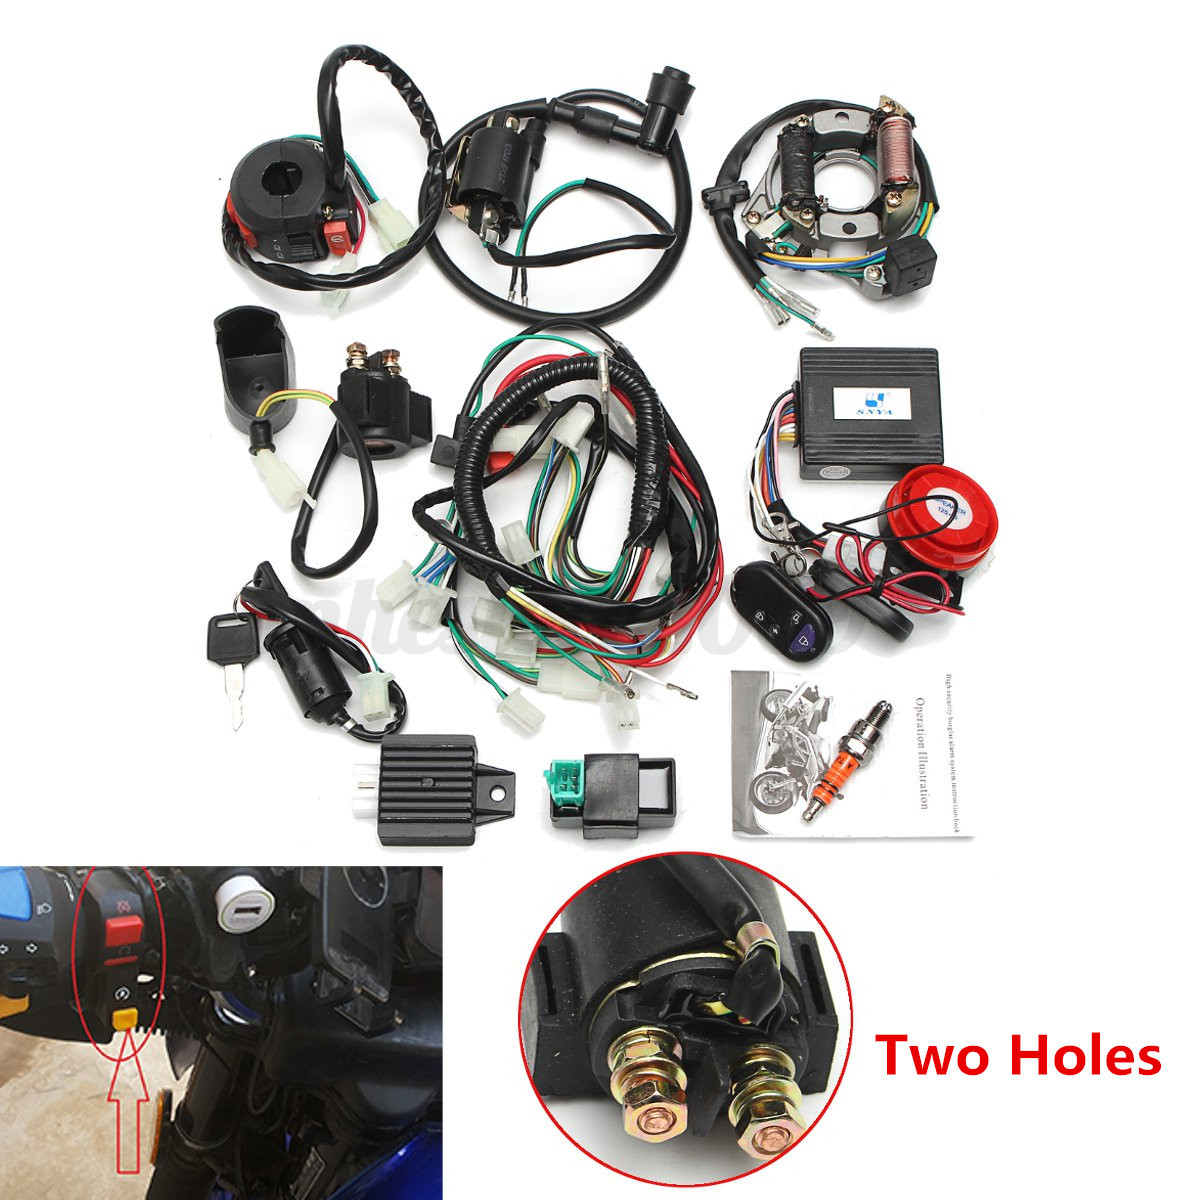 hight resolution of cdi wiring harness 50cc 70cc 110cc 125cc remote start switch for detail image ebay 50cc atv